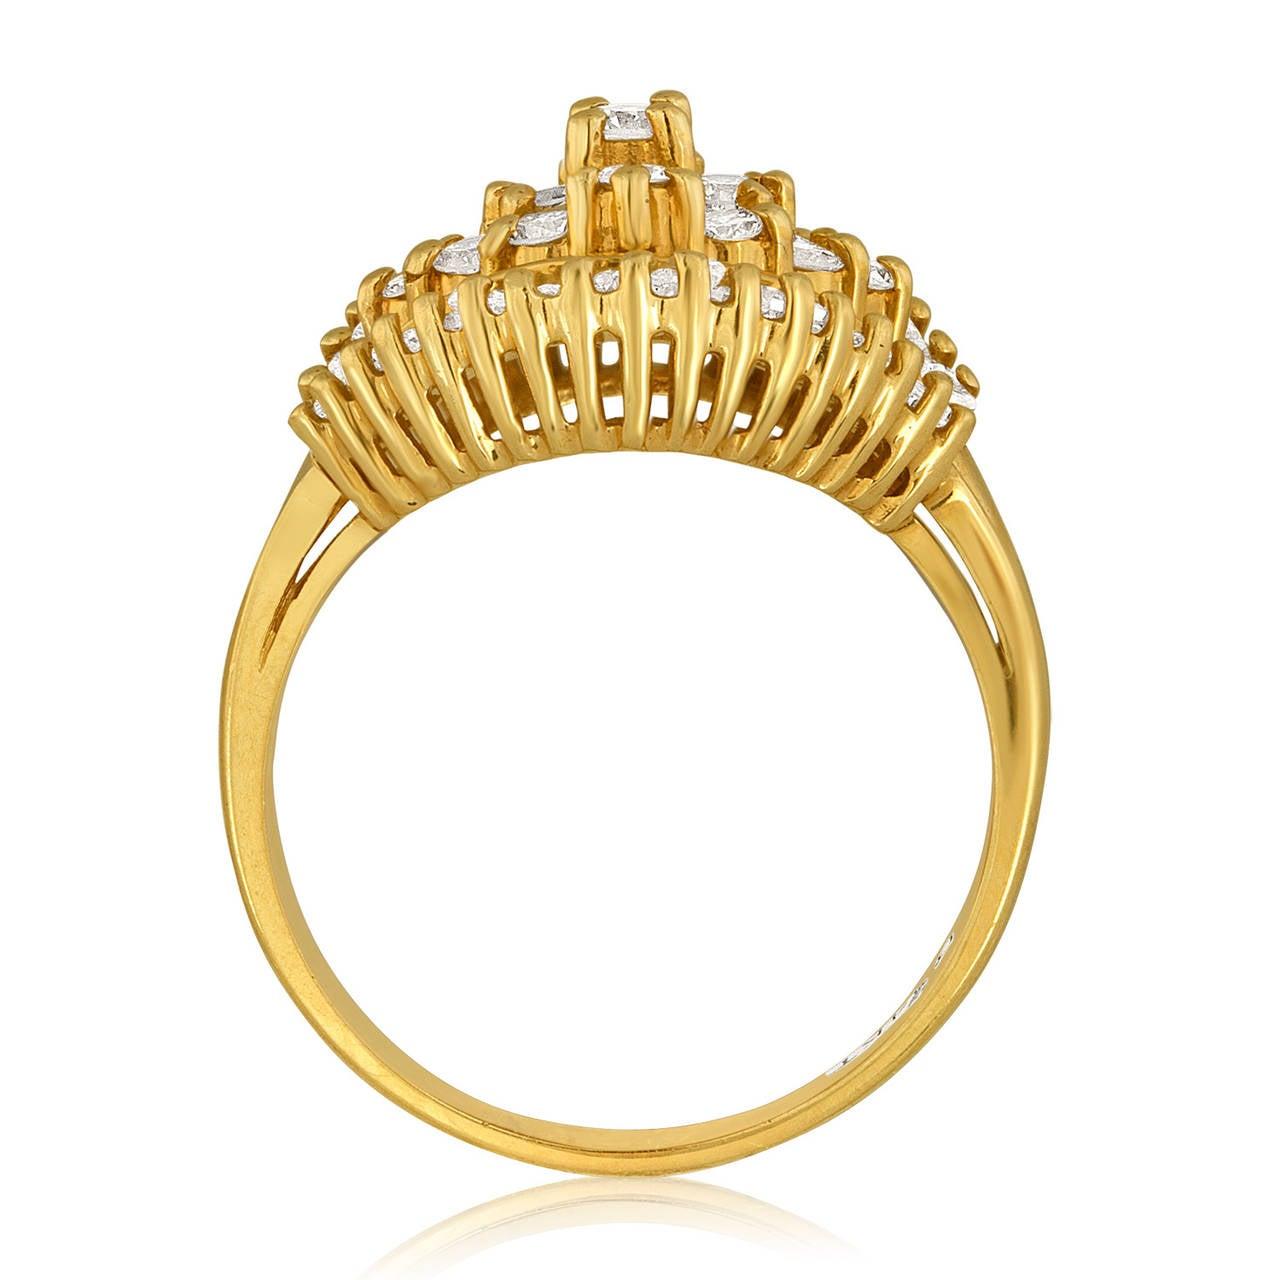 Retro 1990's 1.50 Carats Diamond Yellow Gold Ballerina Ring For Sale